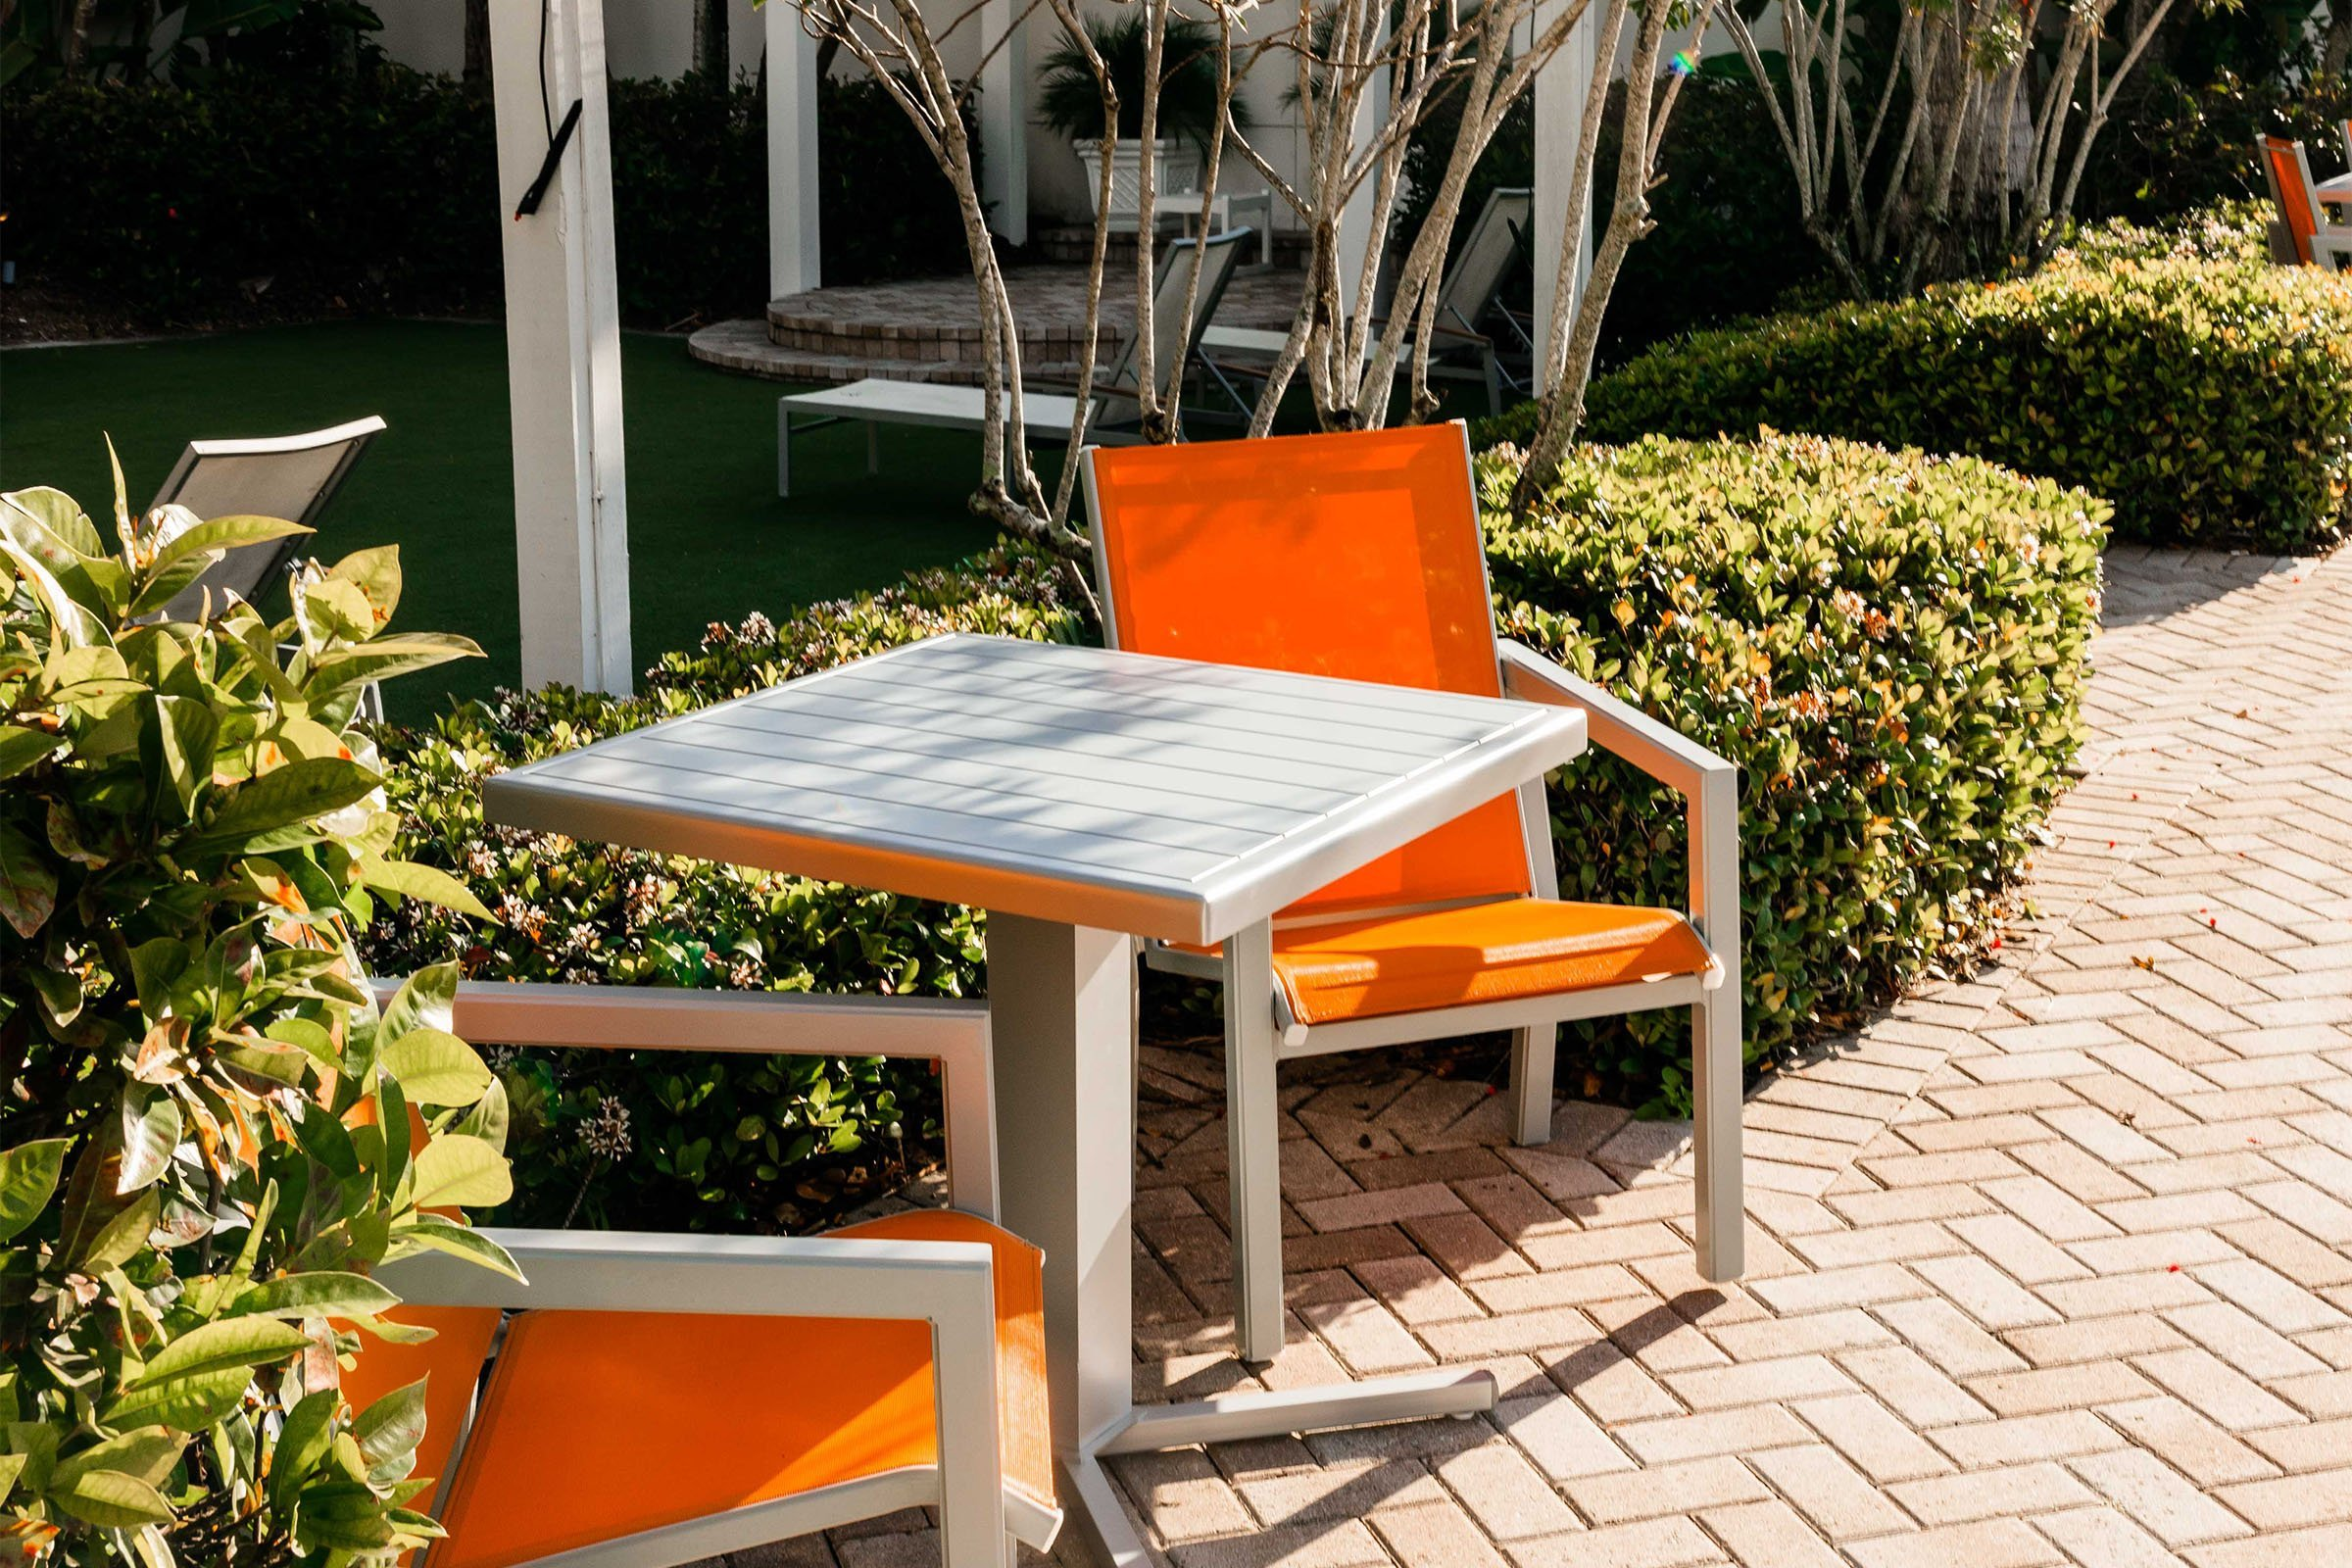 craftsmanship in outdoor furniture